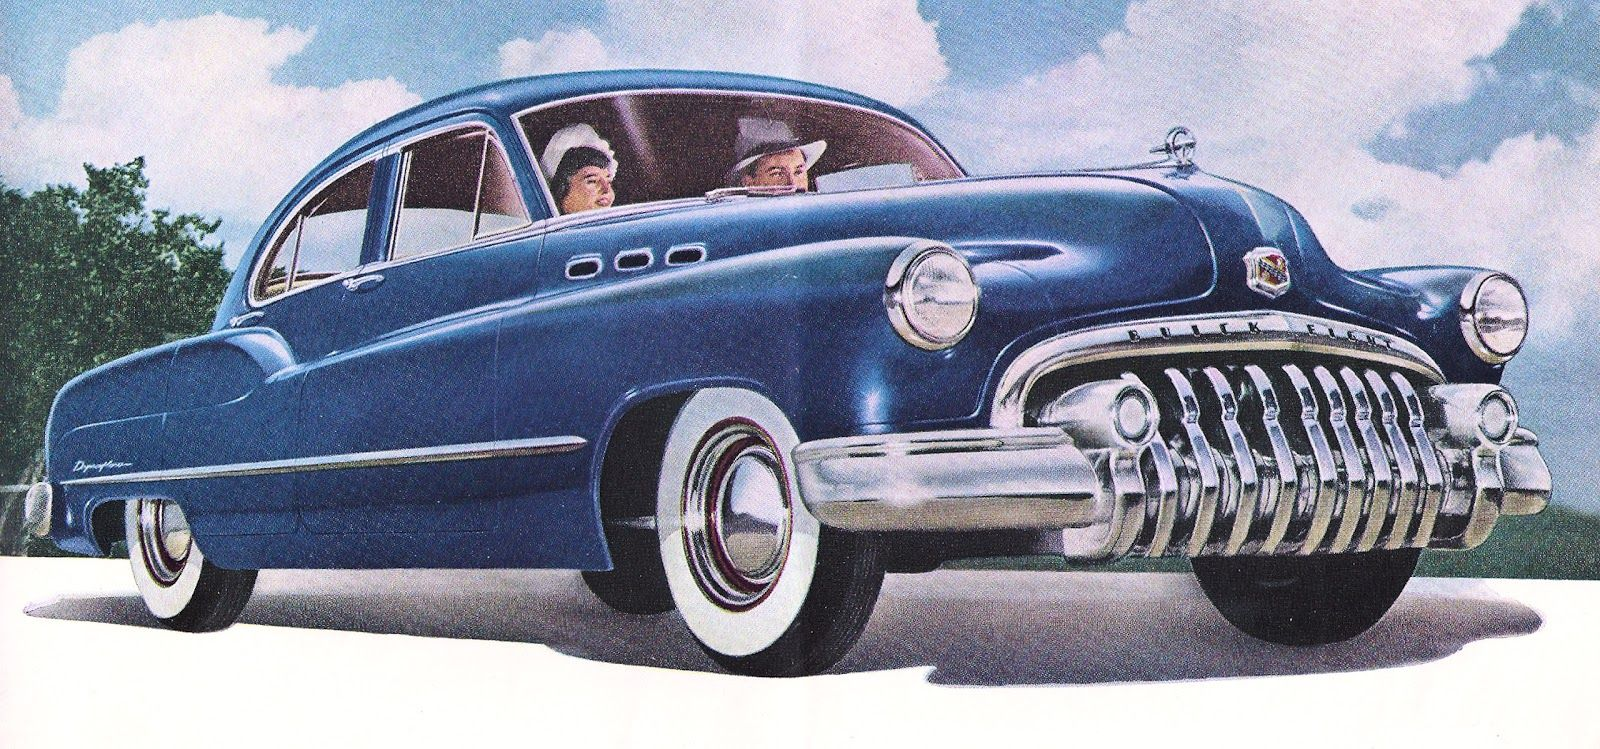 Rare classic s cars. 50s clipart 50's car